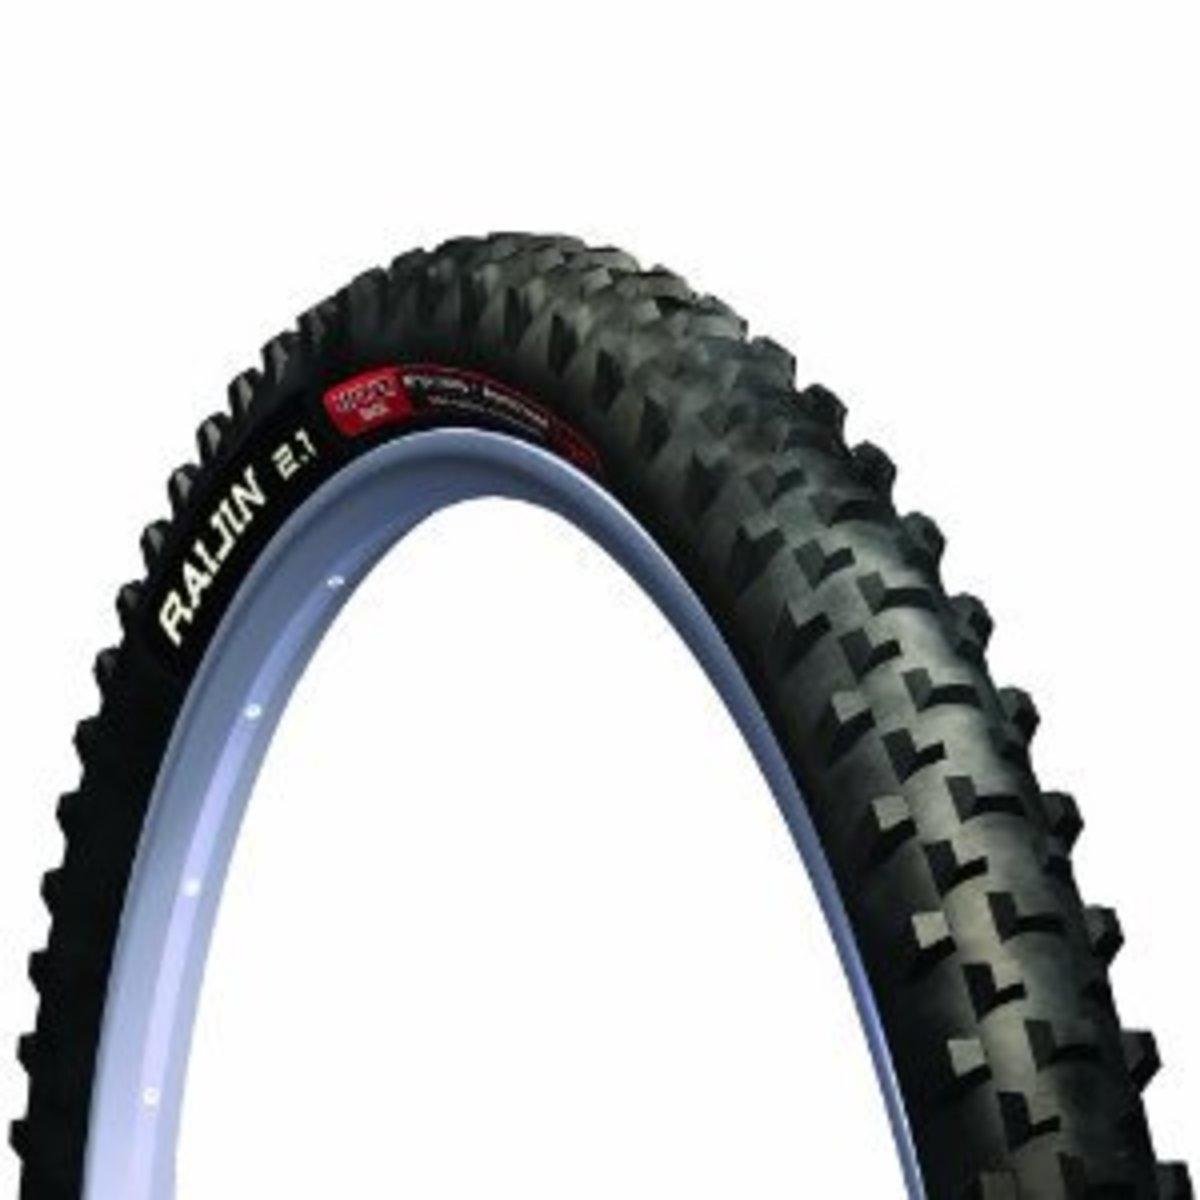 WTB Raijin mountain bike tires for muddy conditions cyclocross racing